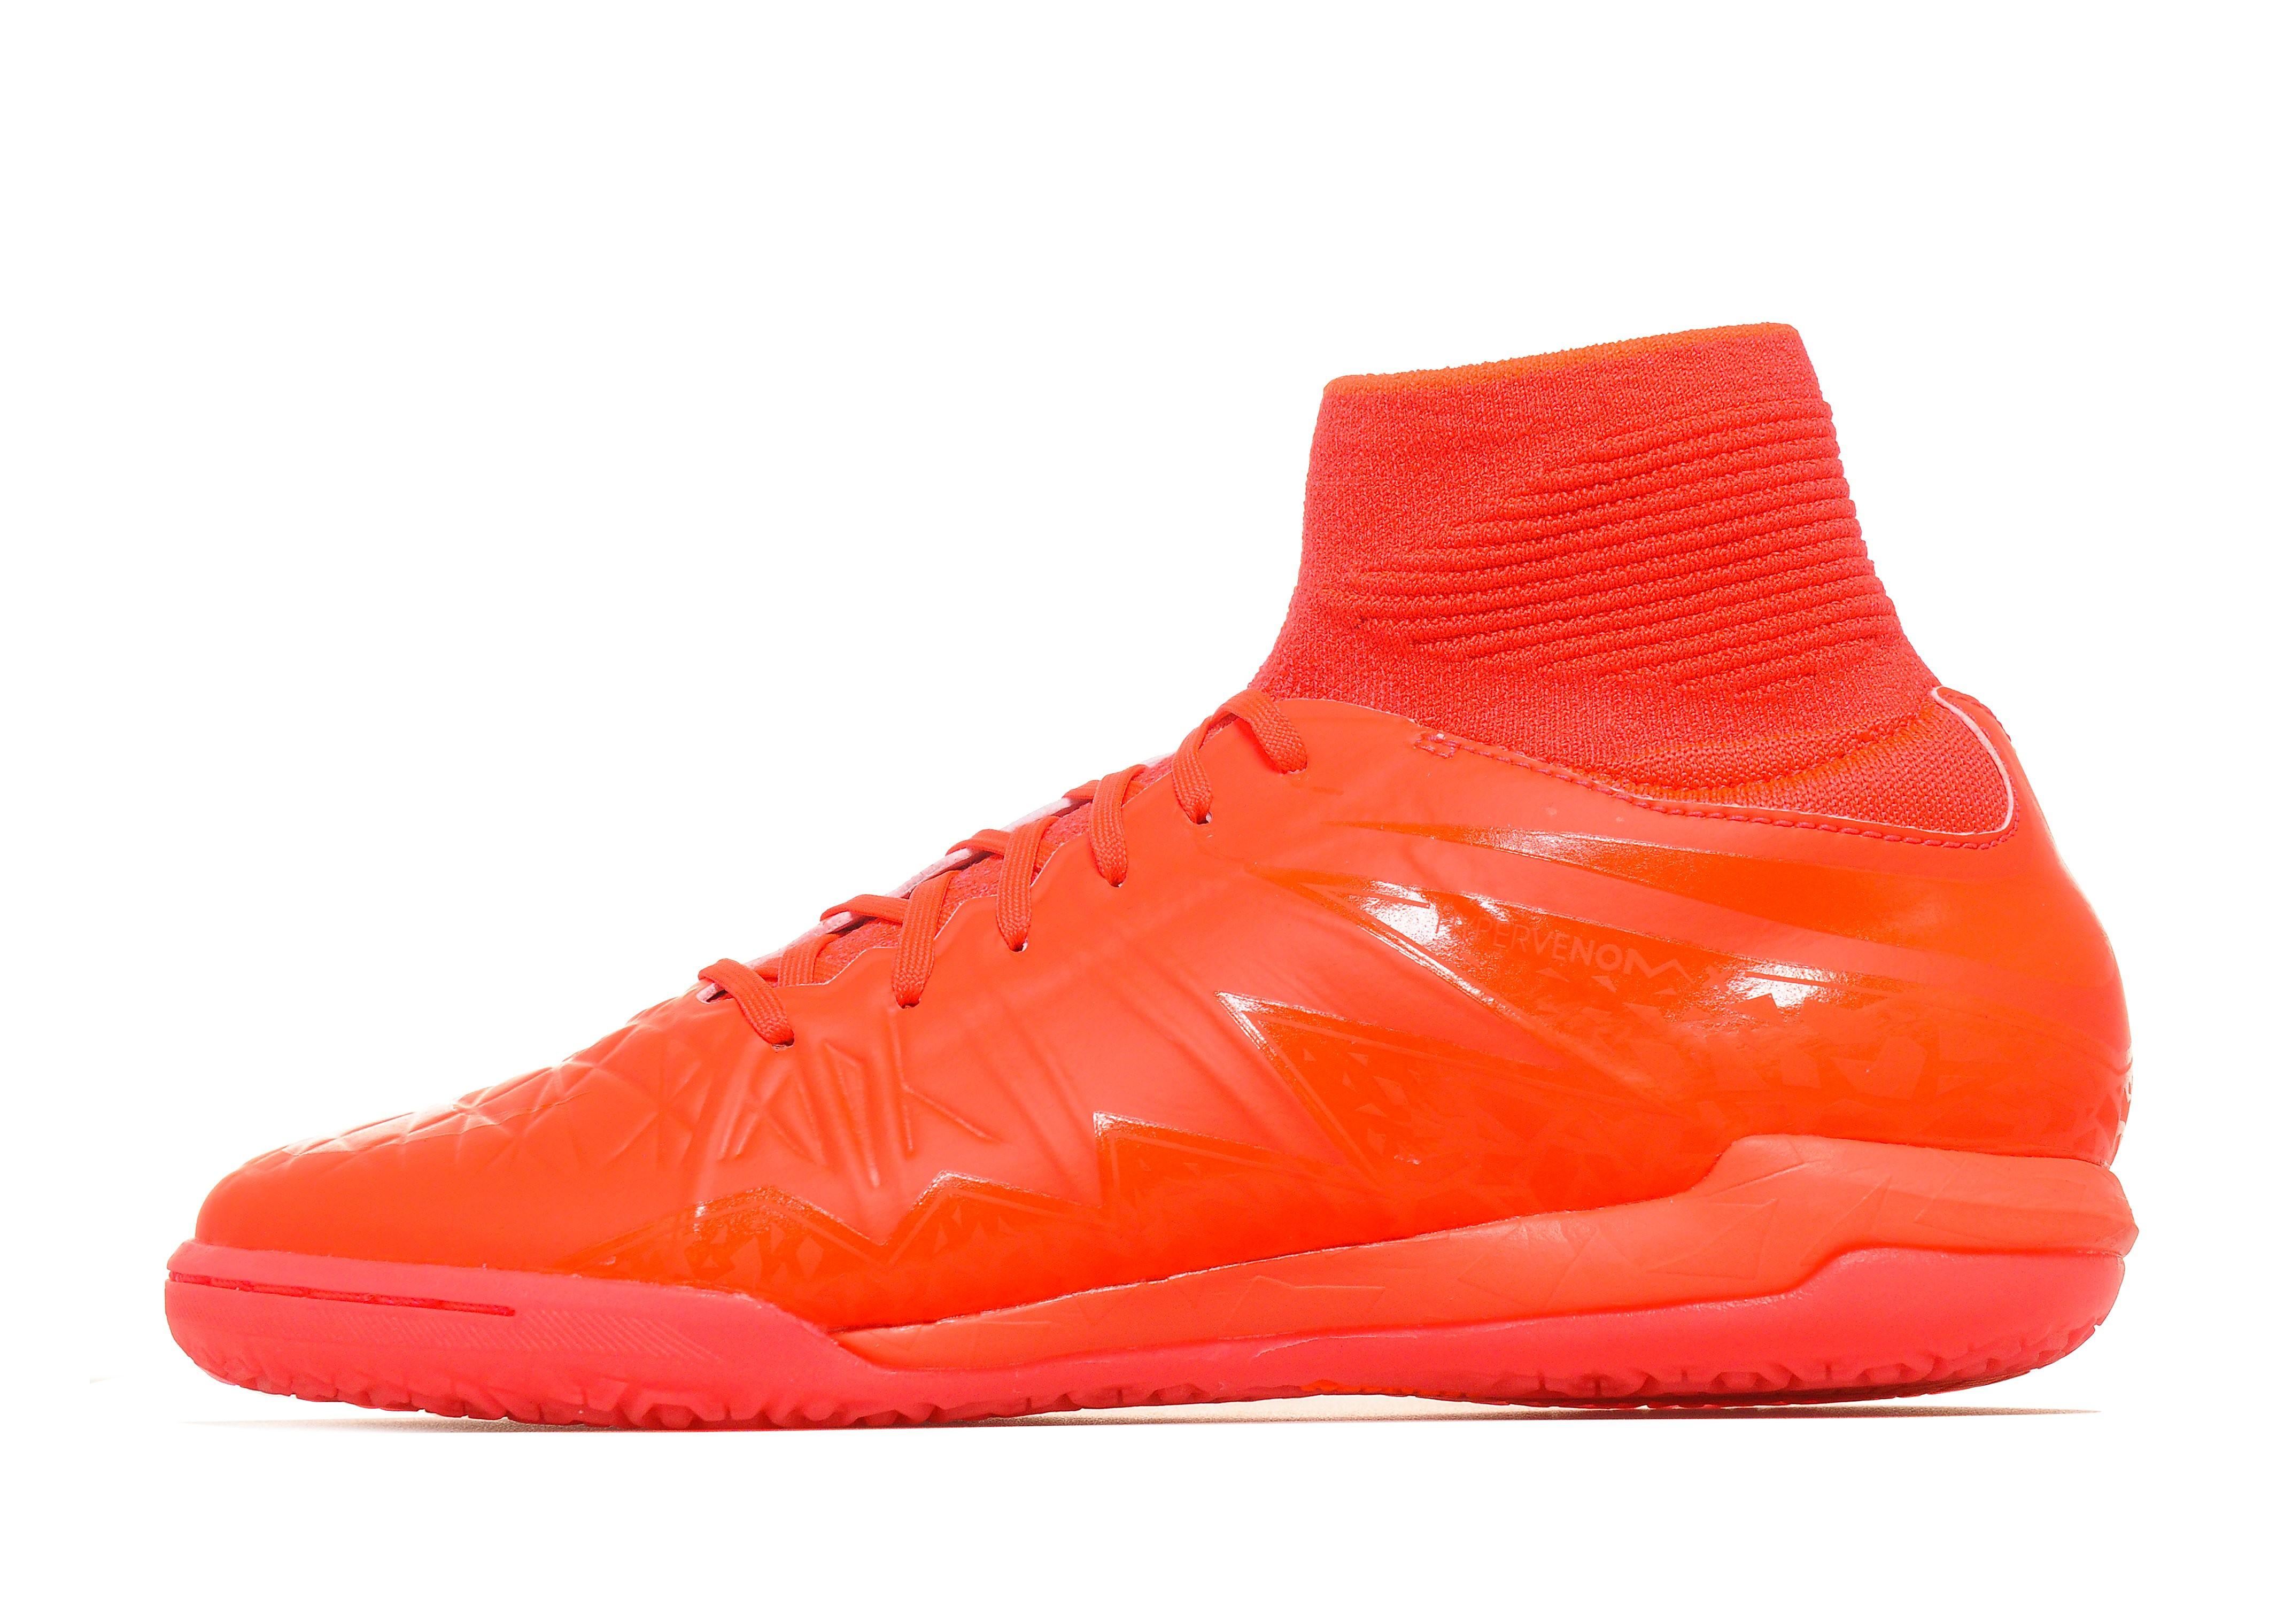 Nike Football X Glow HypervenomX Proximo IC Junior